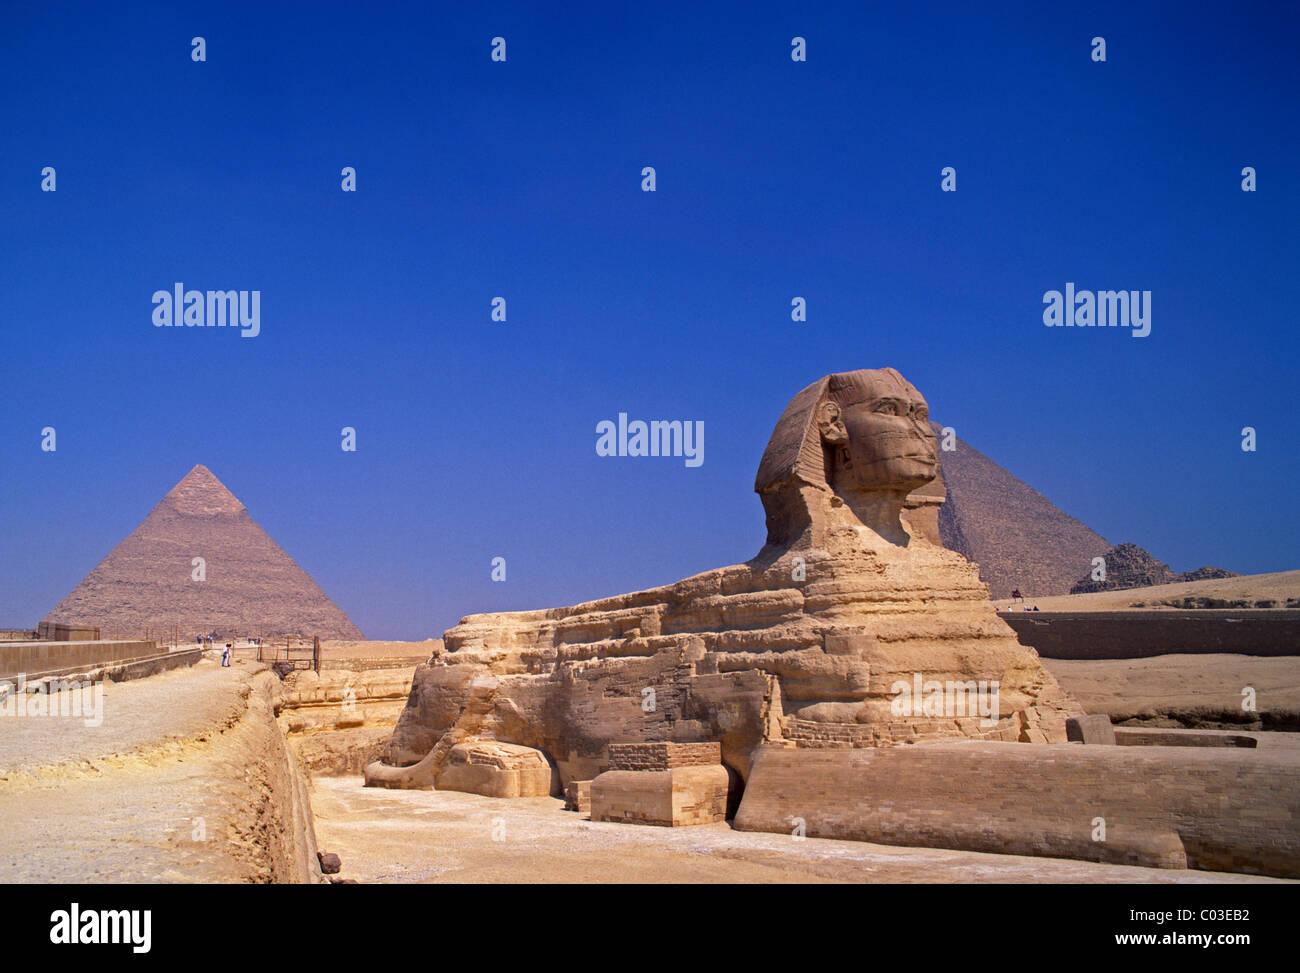 Egypt, Giza, sphinx and pyramids - Stock Image